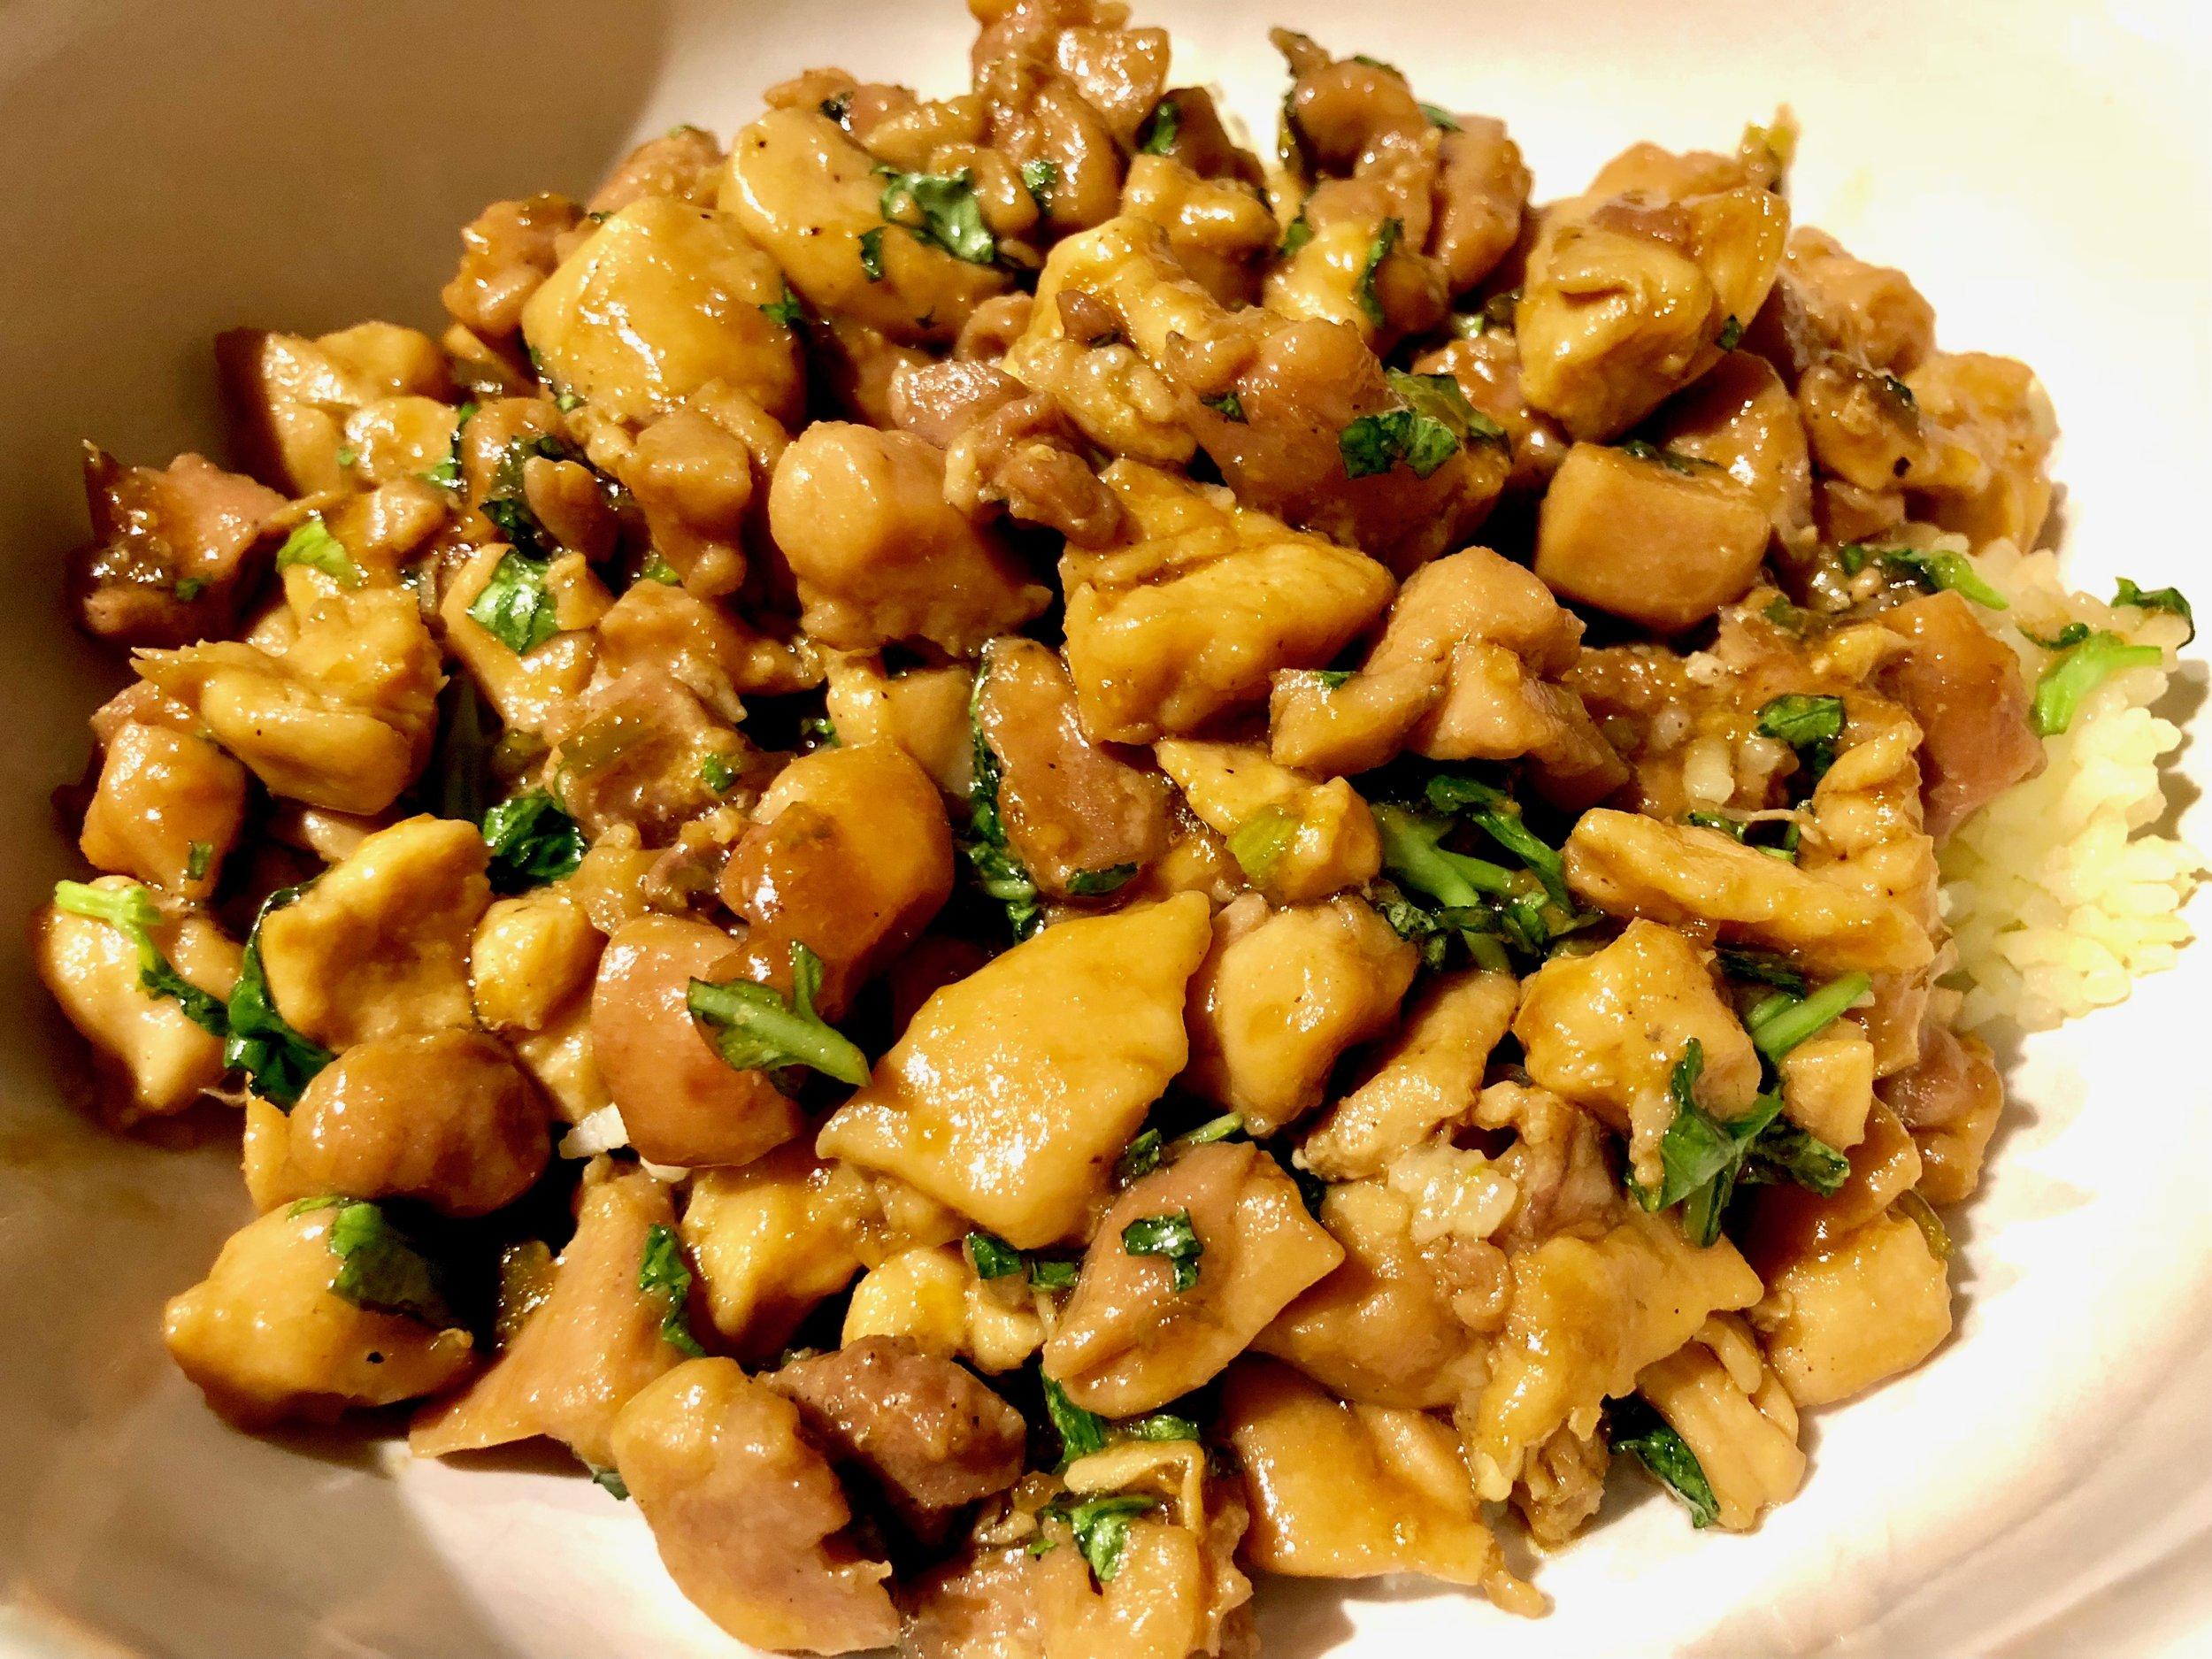 Sweet and Spicy Thai Basil Chicken Erica Bethe Jewtalian